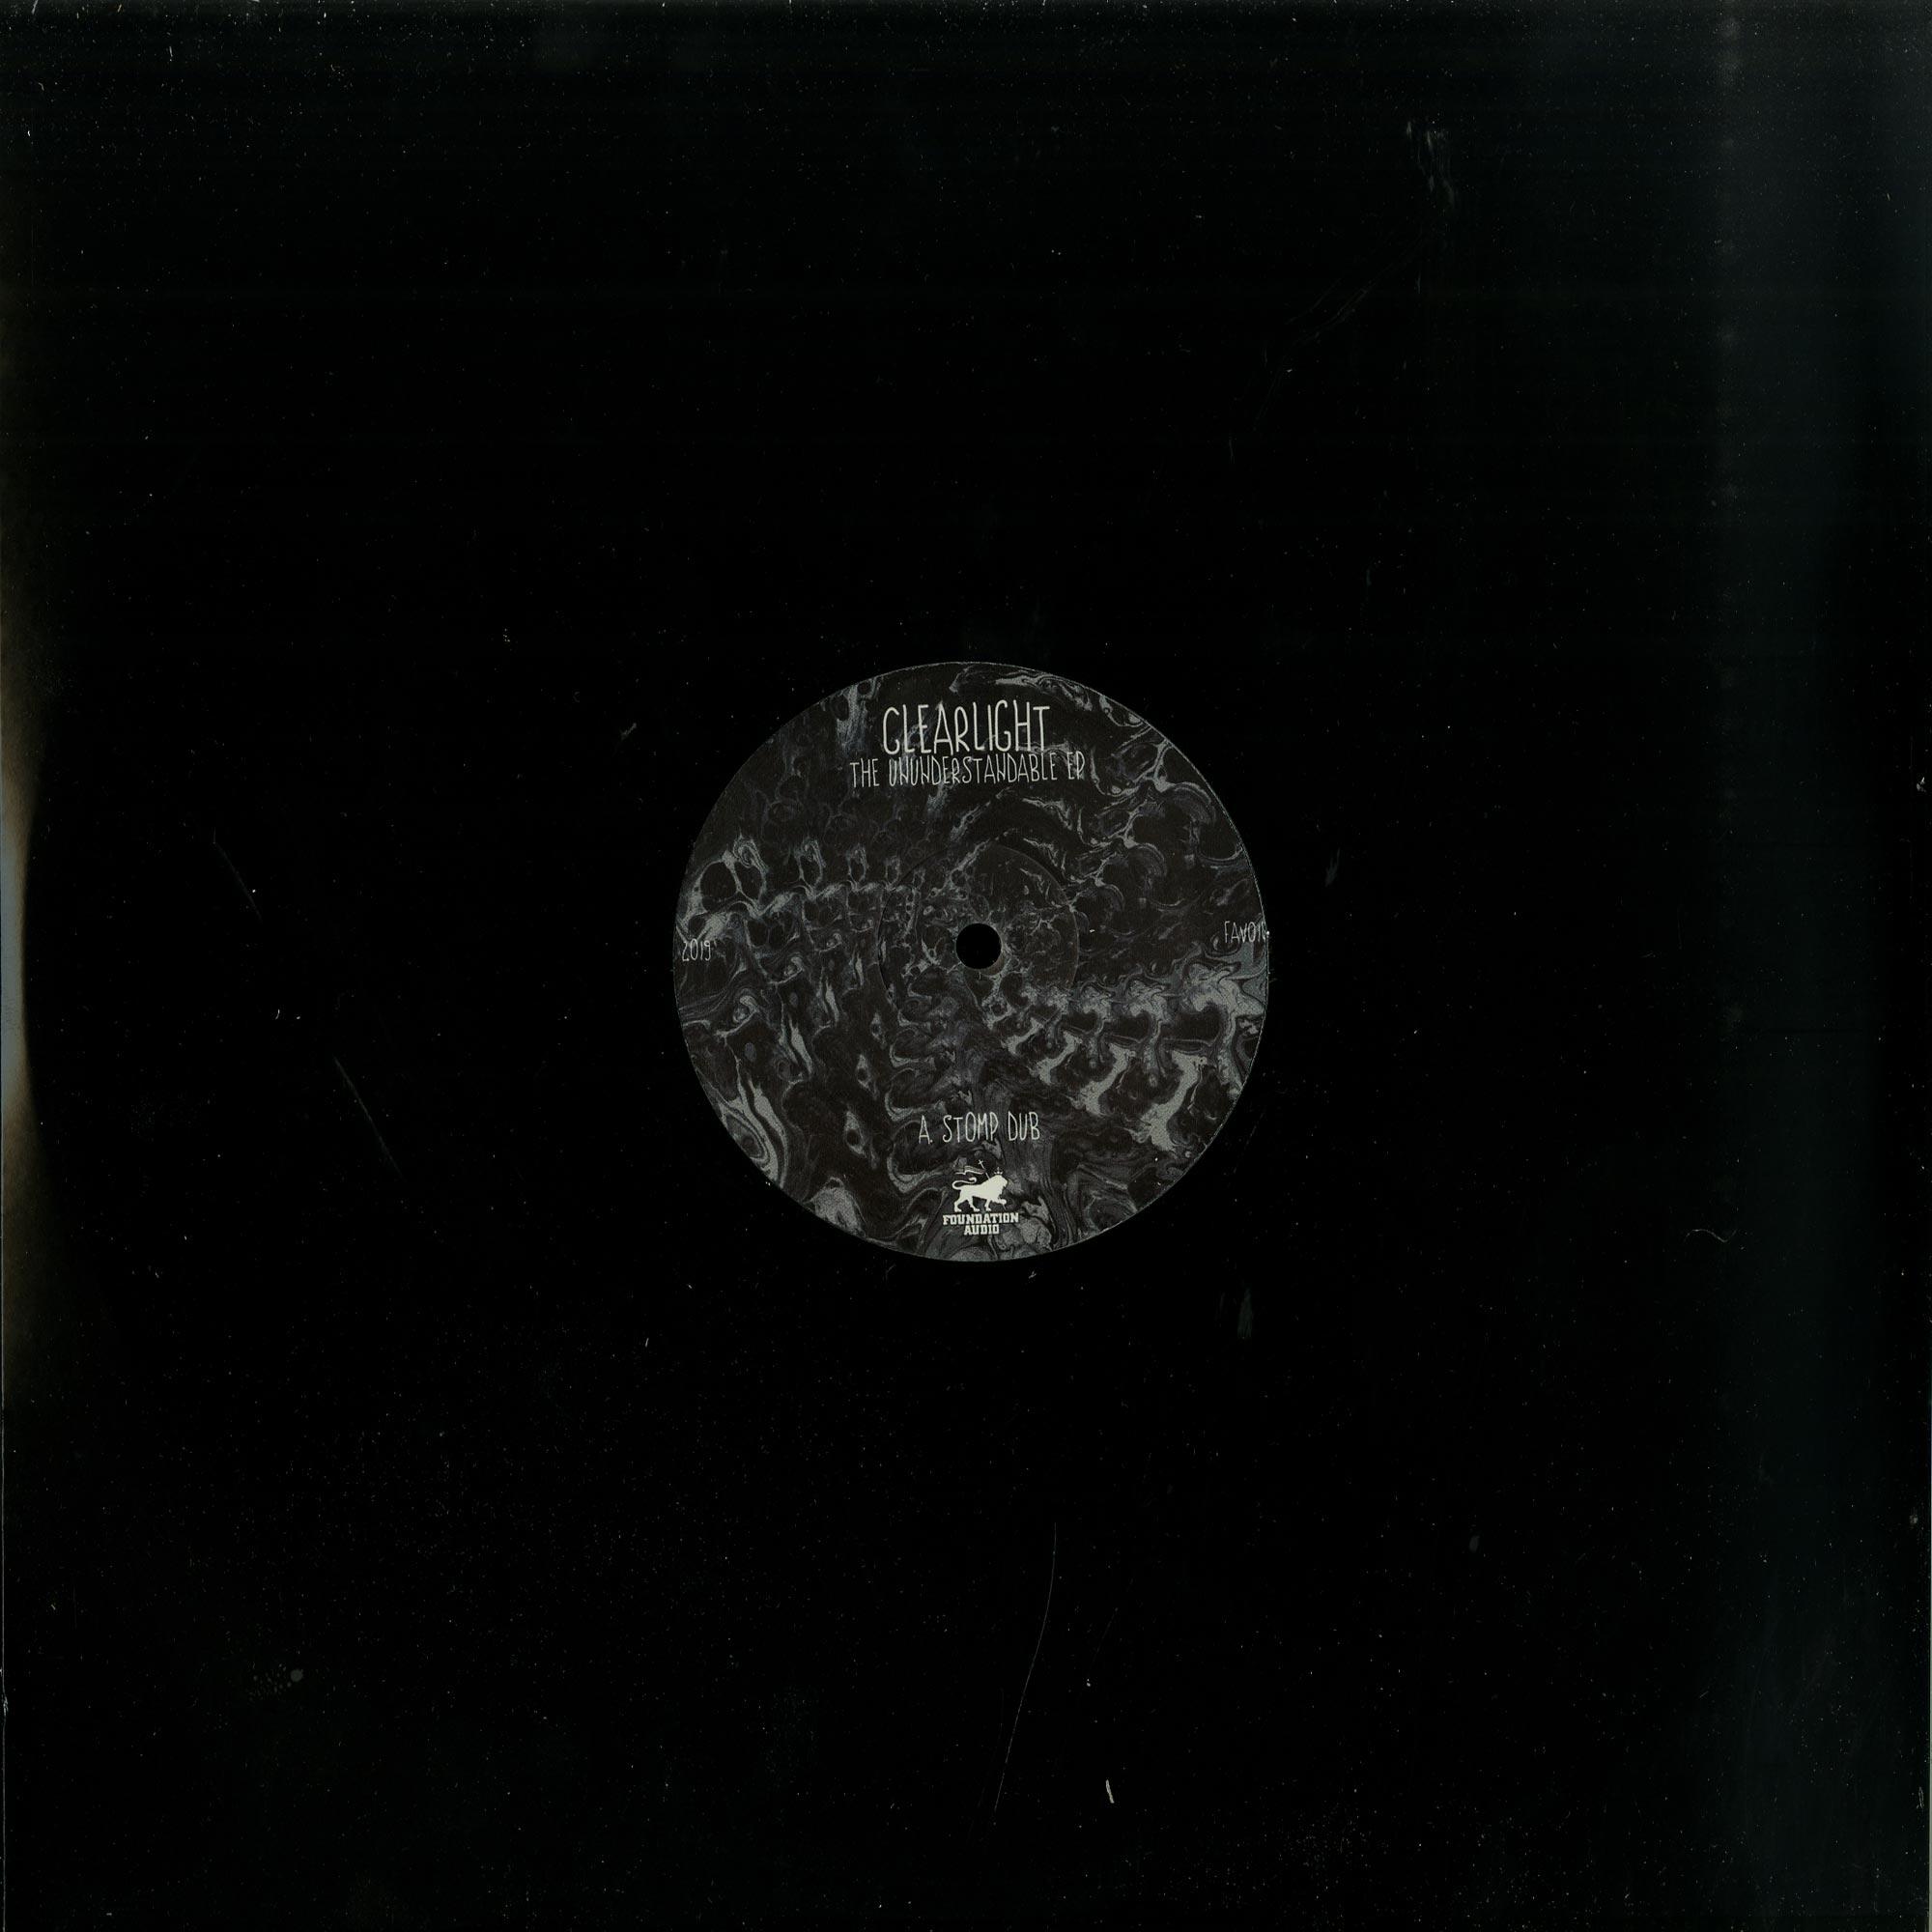 Clearlight - UNUNDERSTANDABLE EP